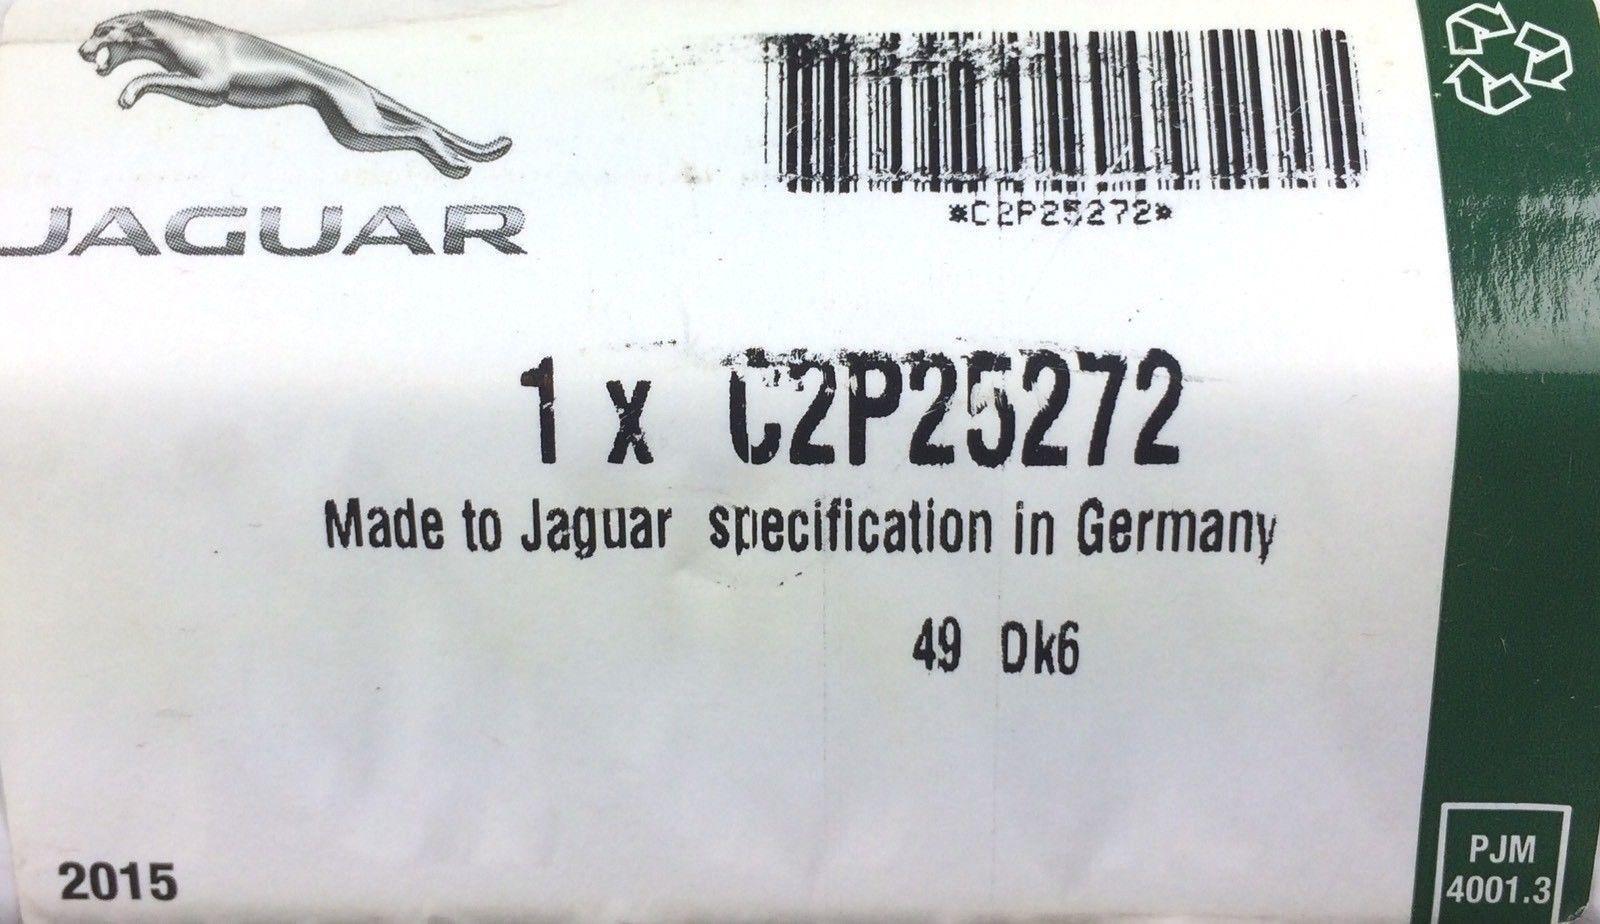 XE, XF, XK, XJ & F-TYPE CASTROL BOT 750B DIFFERENTIAL OIL LTR – C2P25272.